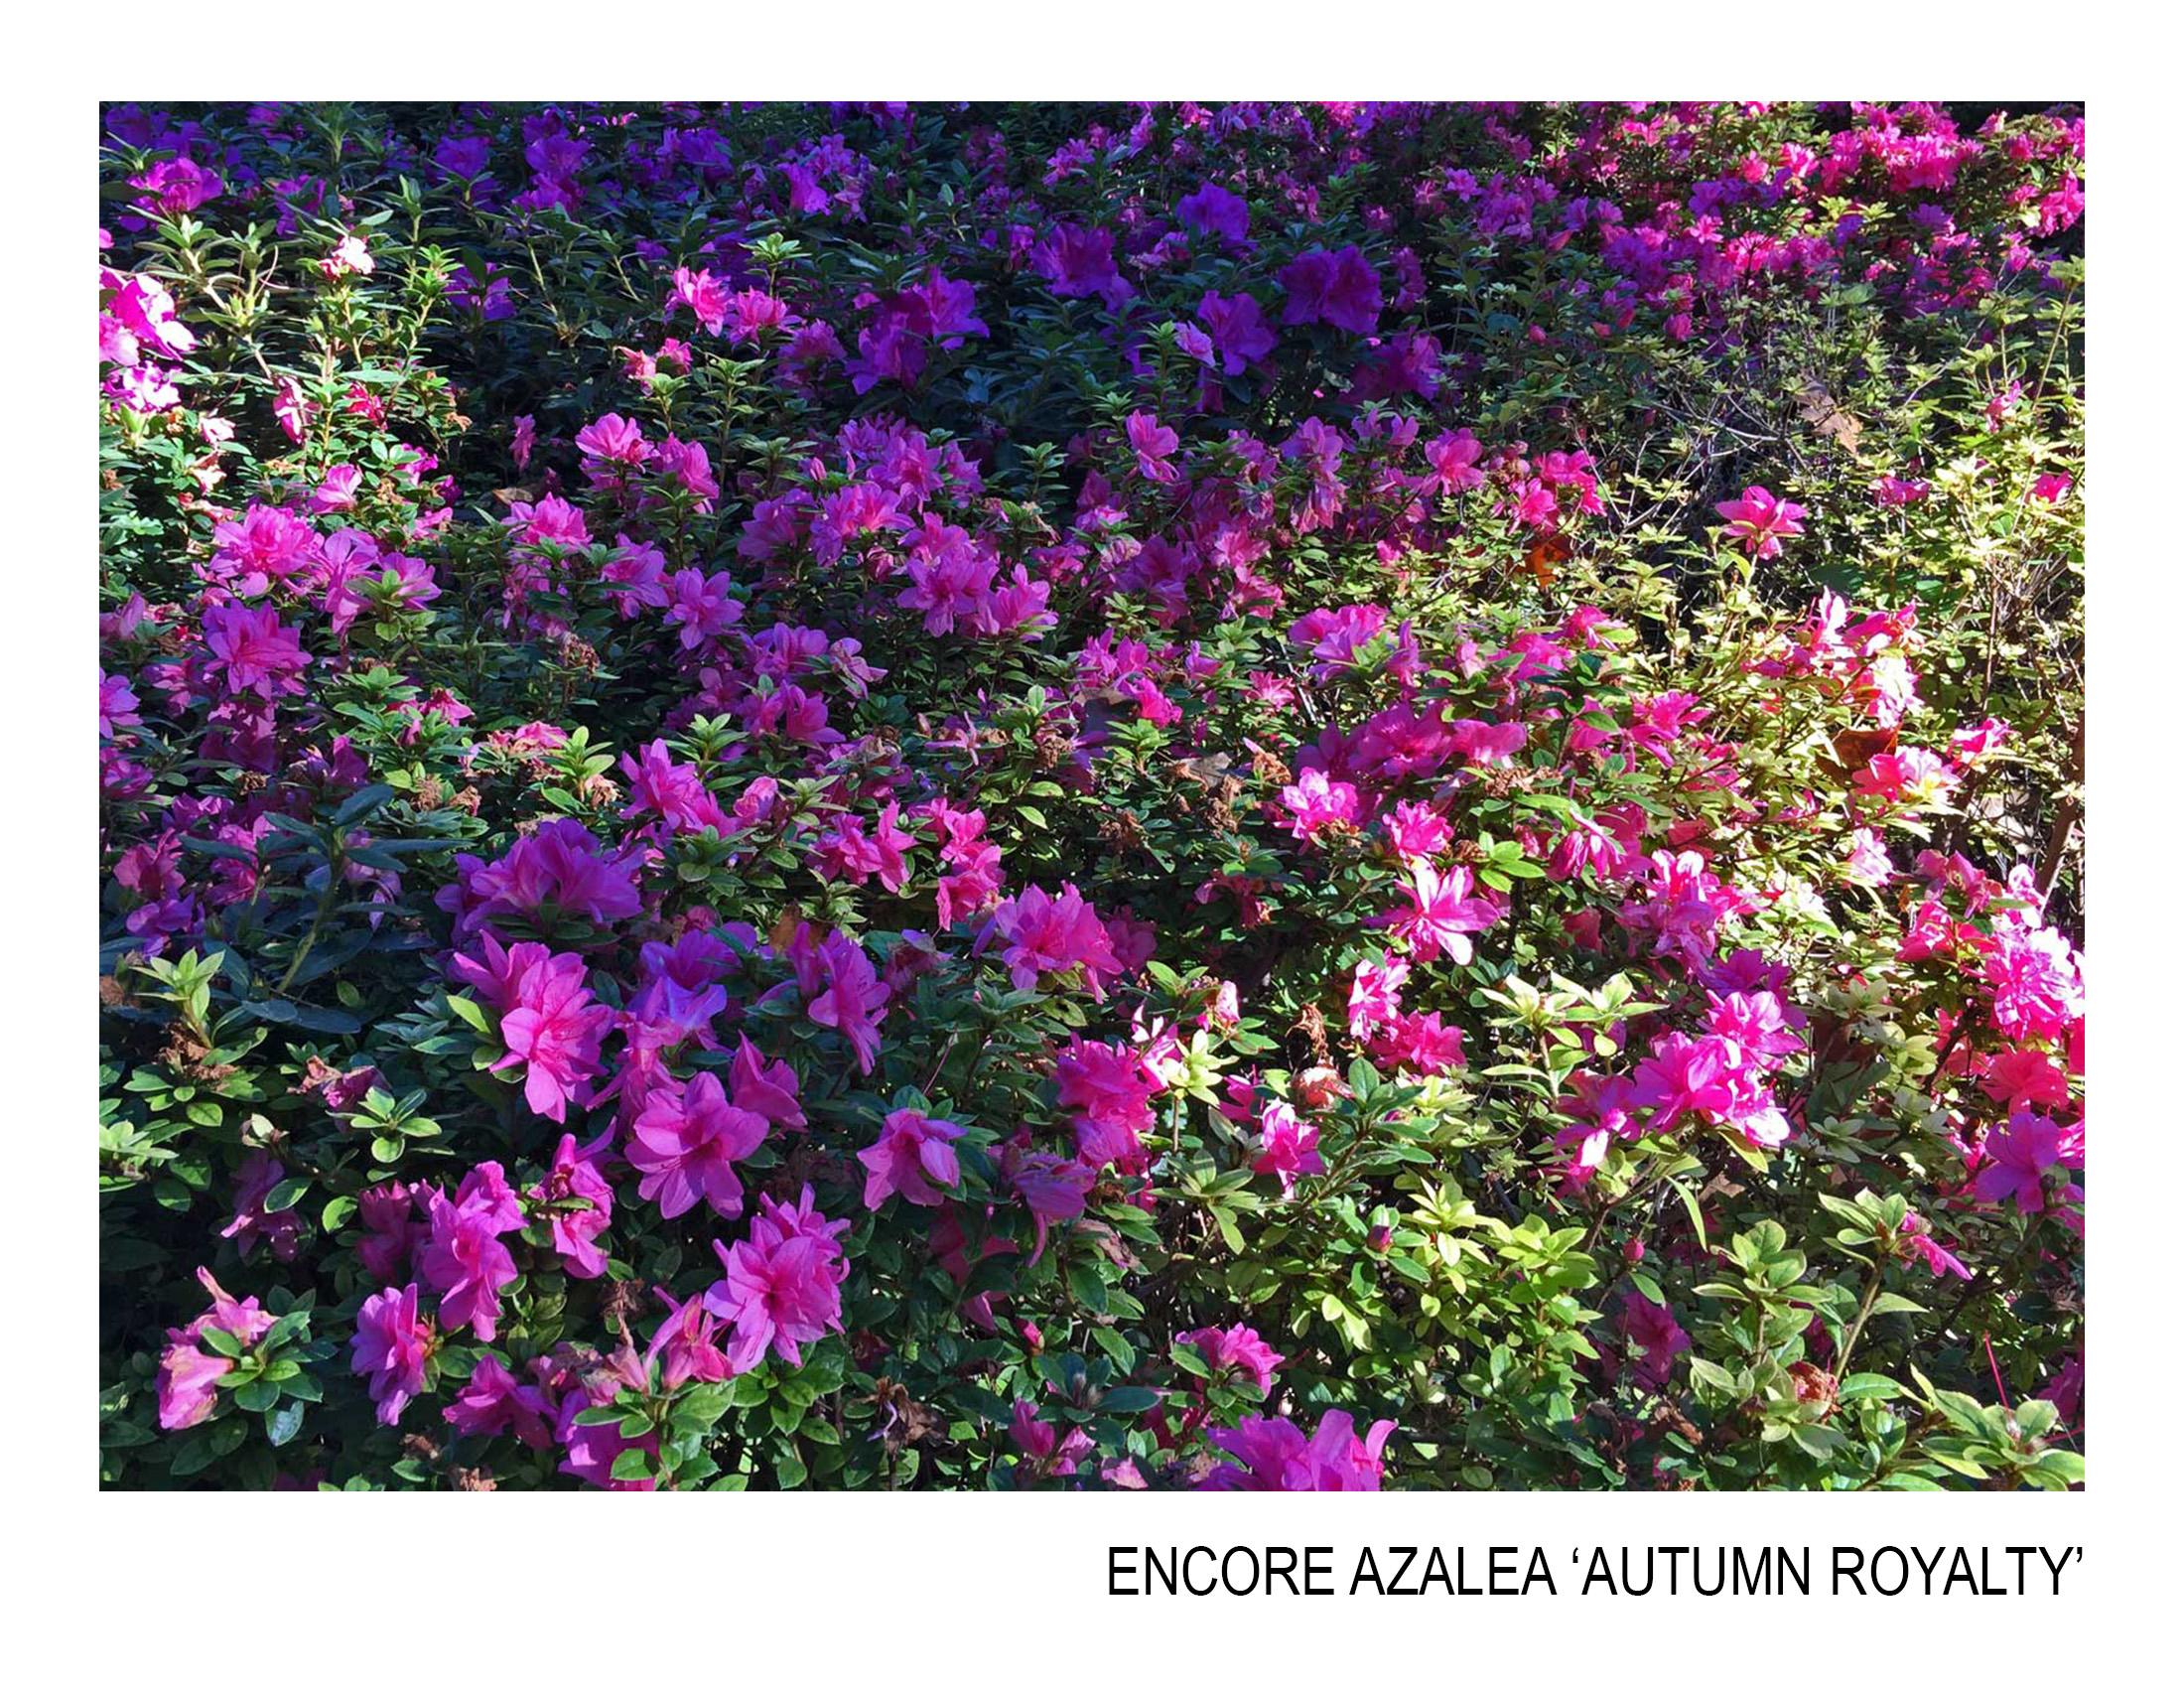 encore azalea autumn royalty.jpg